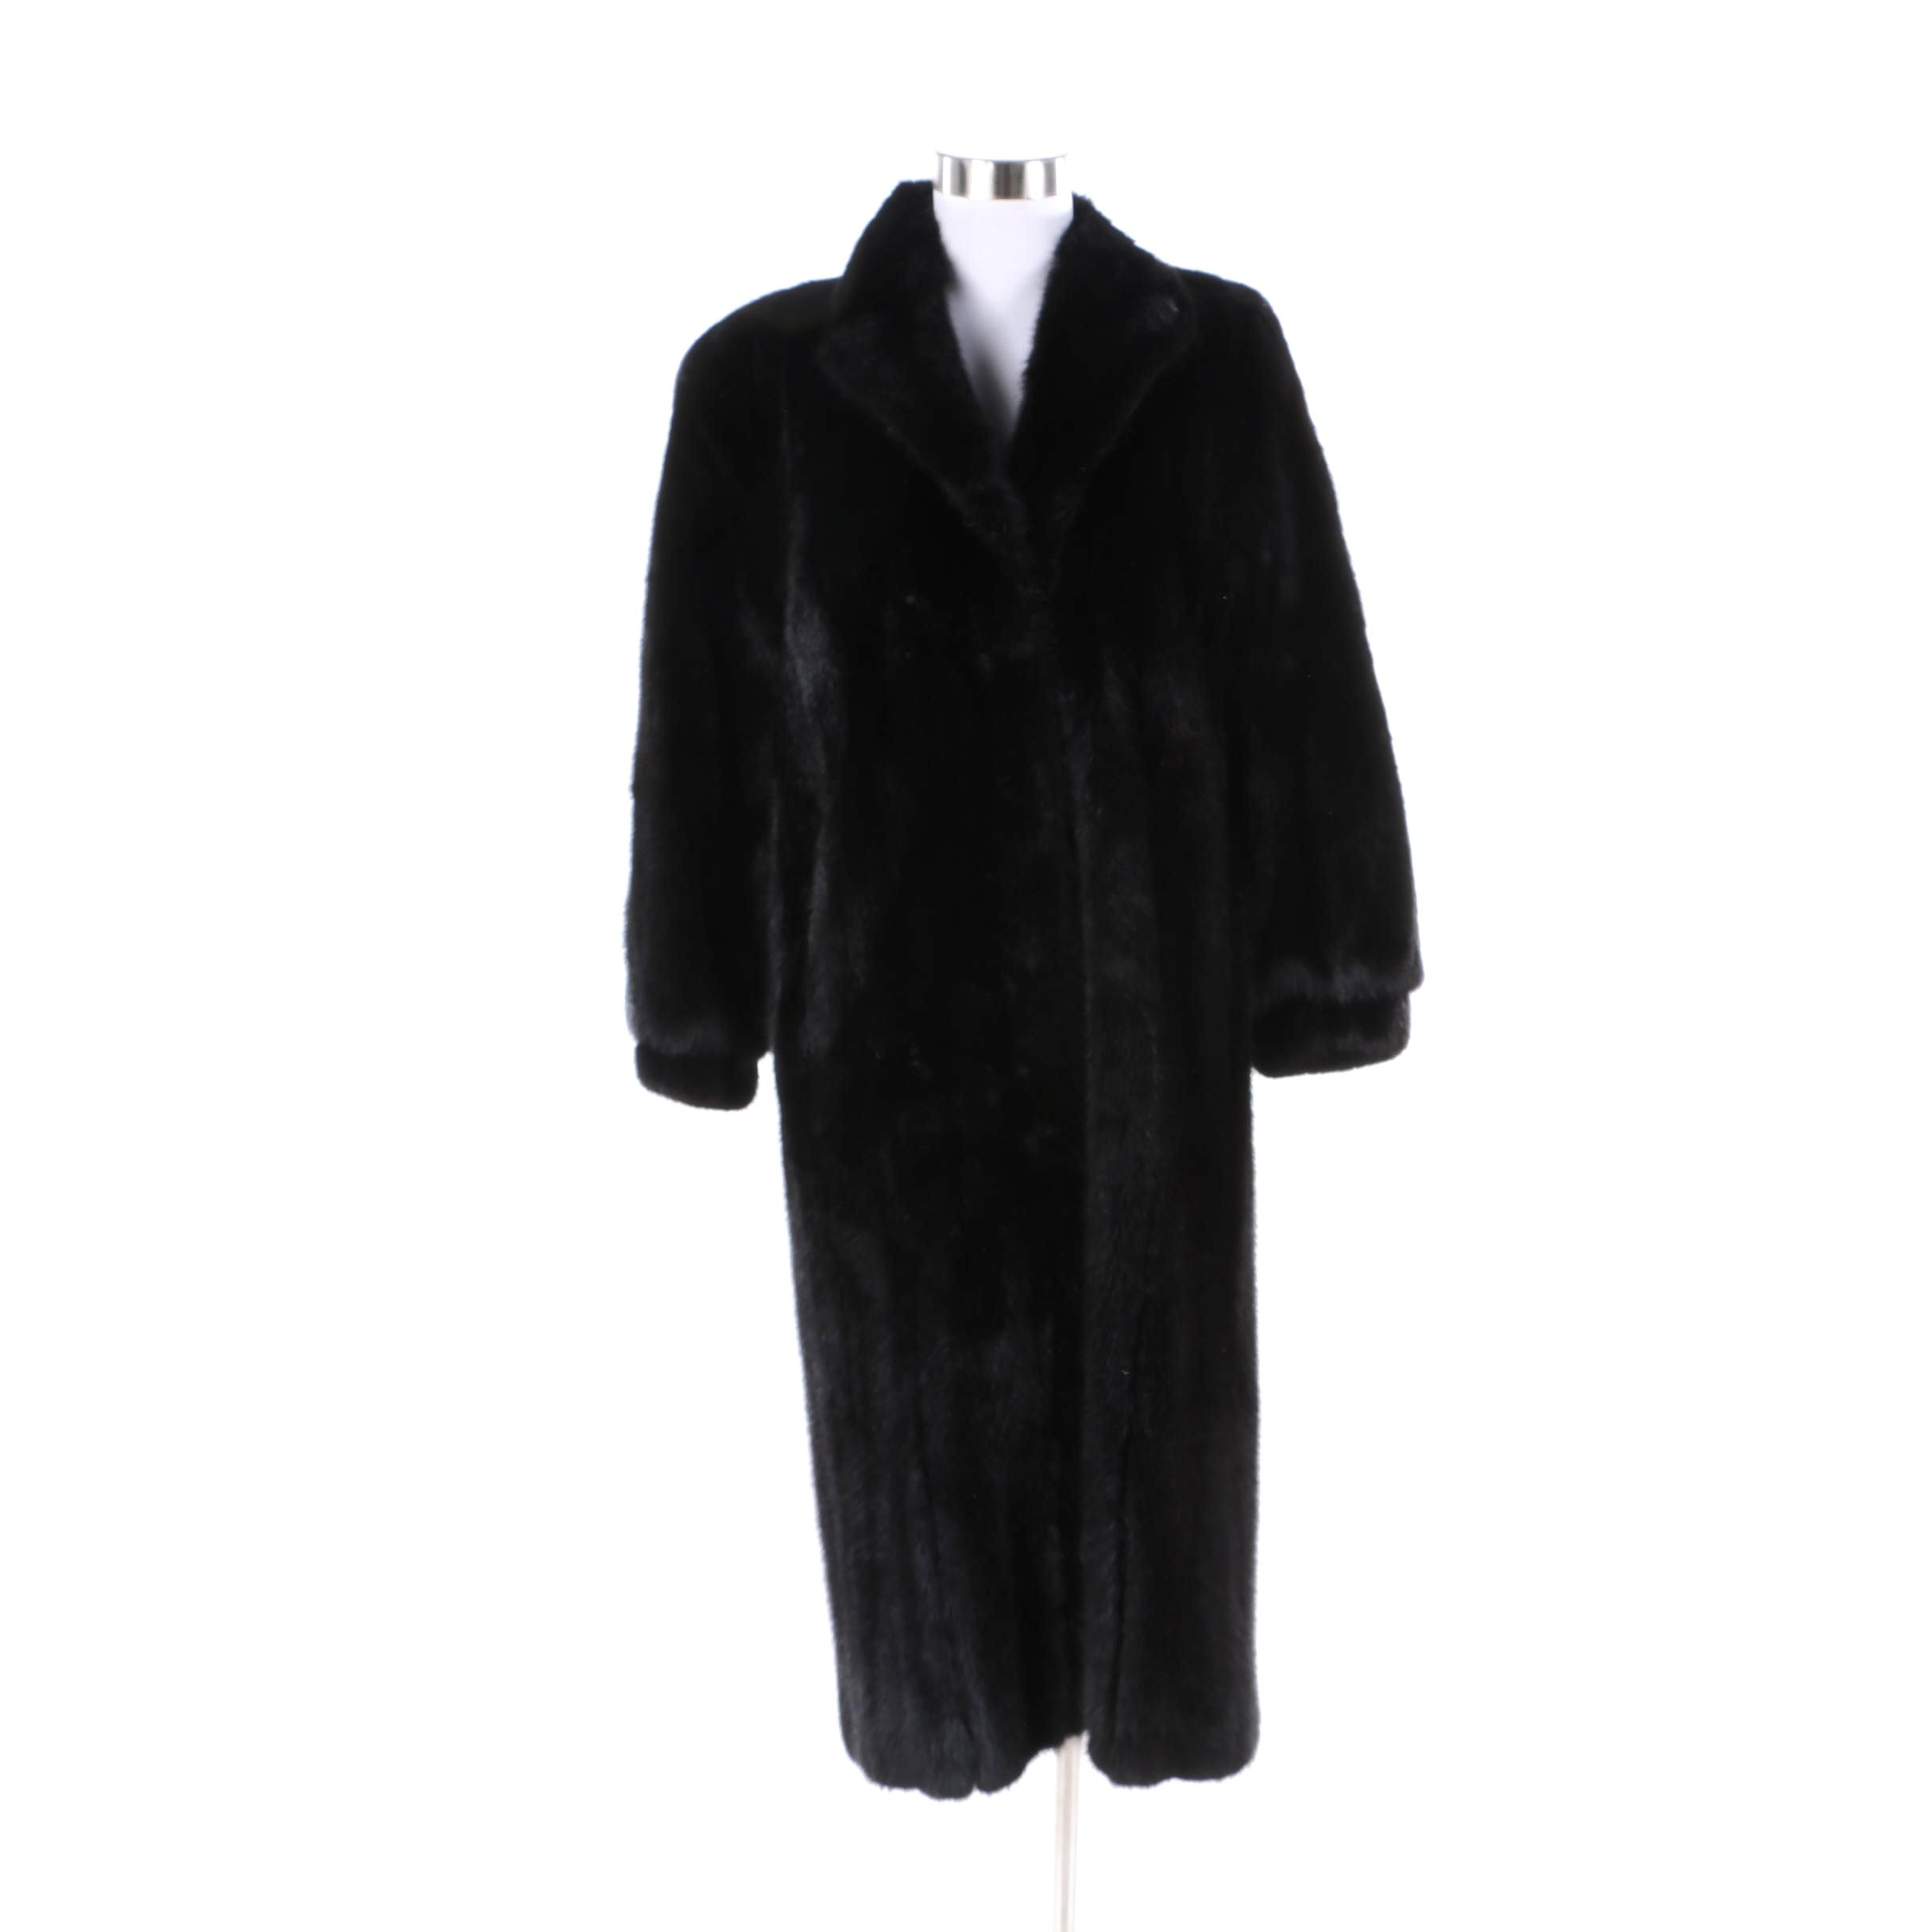 Women's Vintage Lloyd's Dyed Black Mink Fur Coat